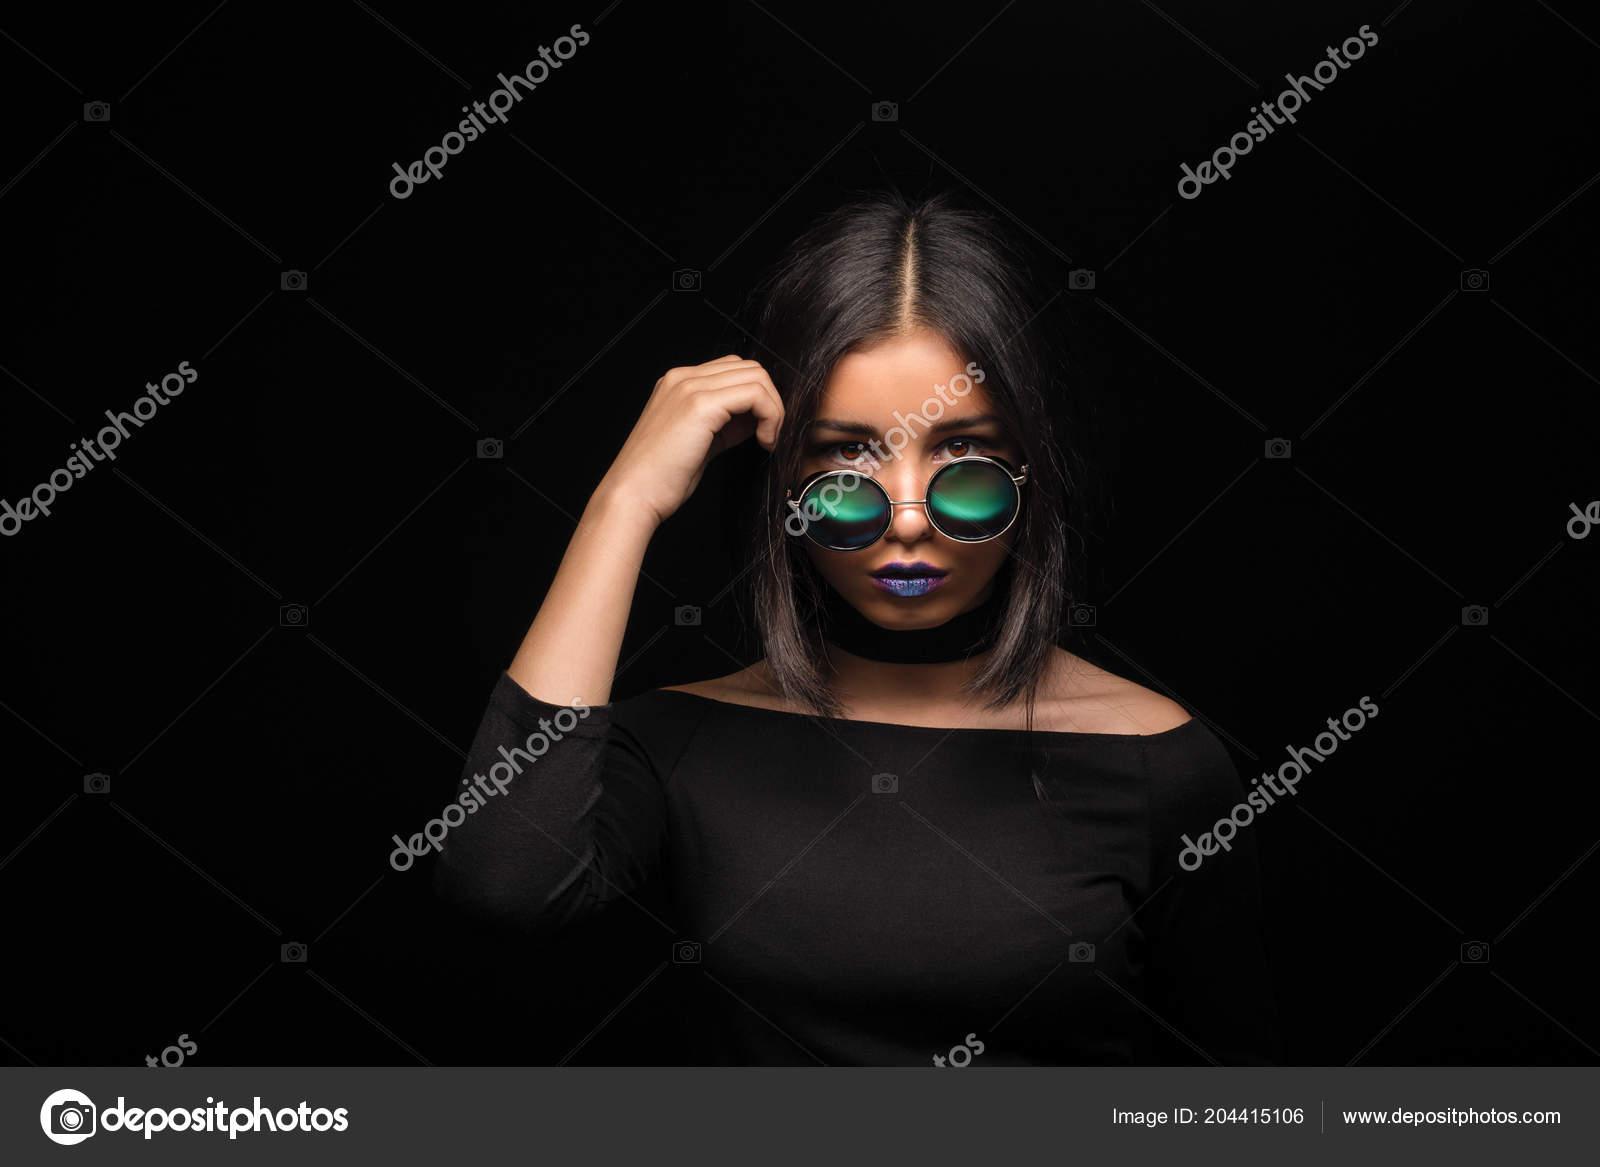 e37e989cd7 Πορτρέτο της δροσερό τρελό κορίτσι μελαχρινή της μόδας στα γυαλιά ηλίου